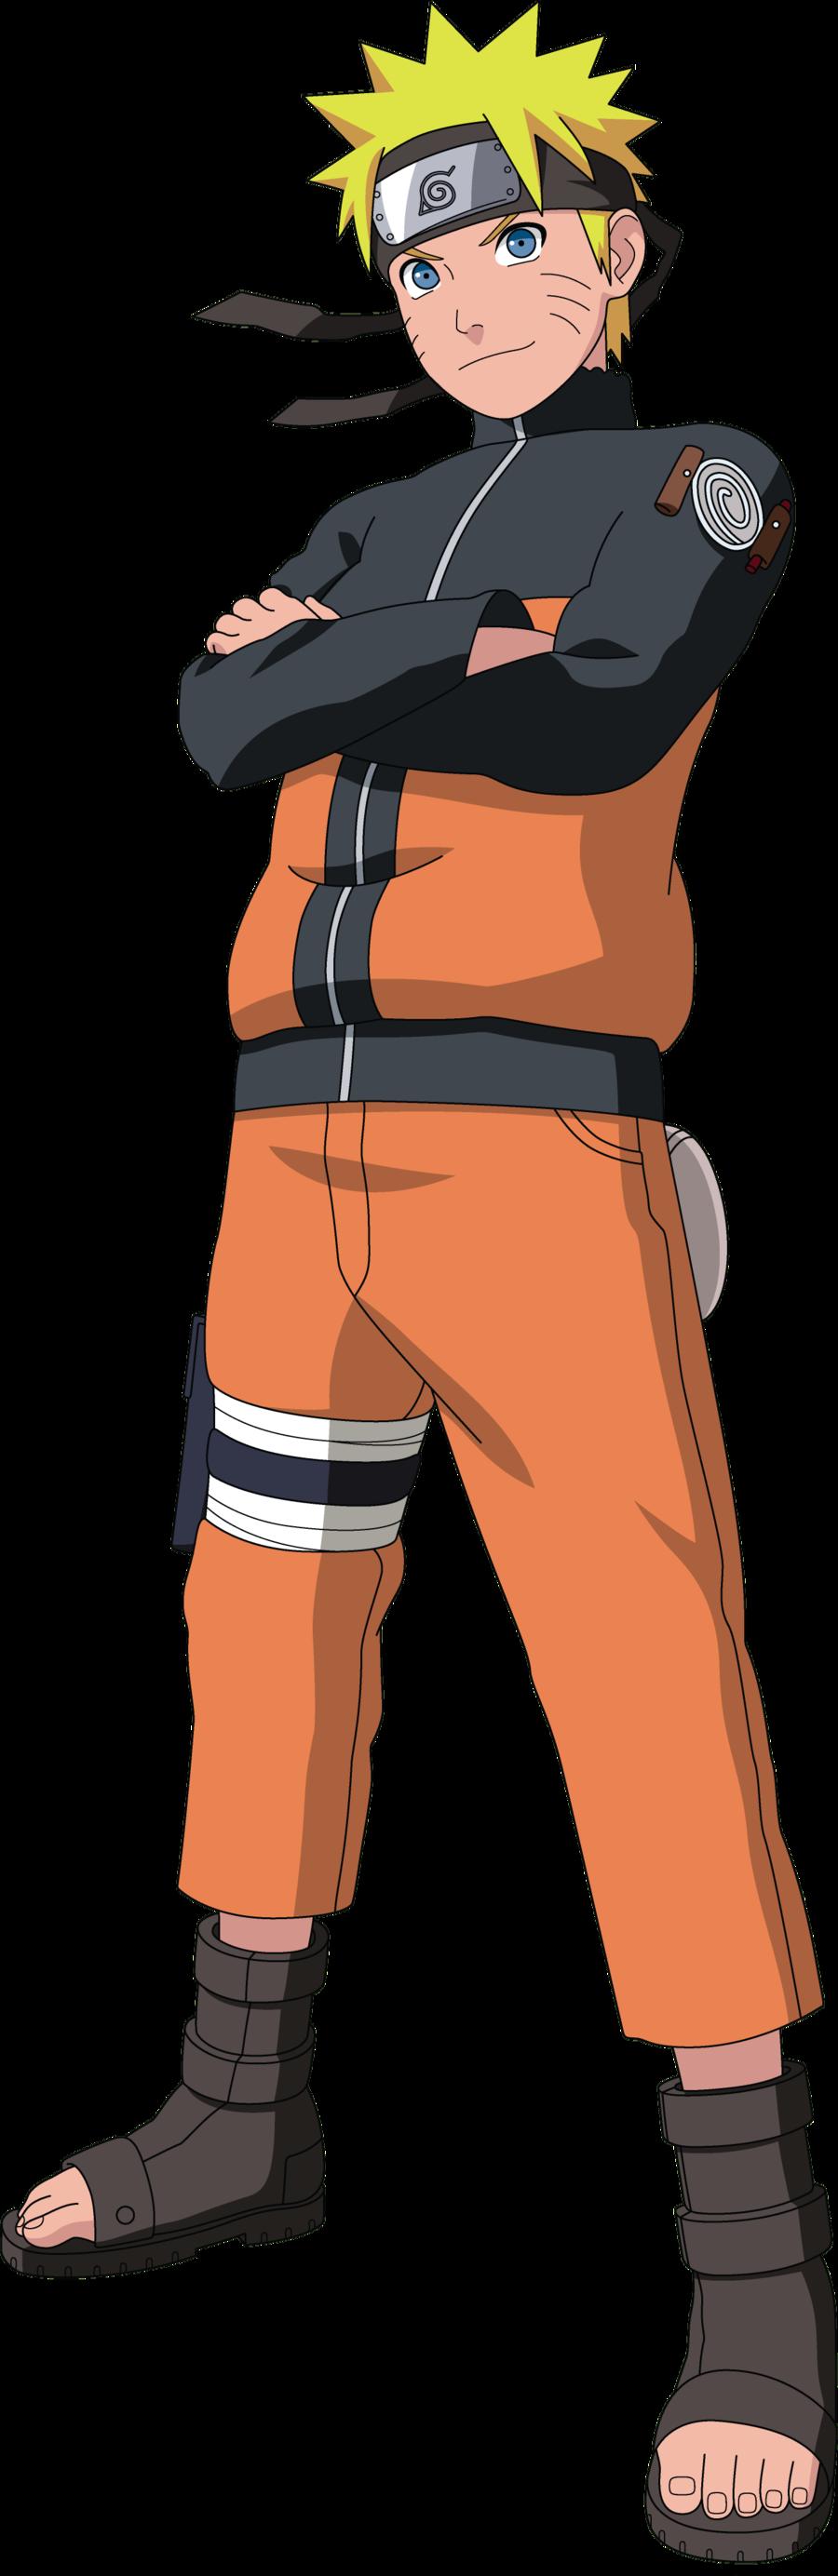 http://images.wikia.com/playstationallstarsbattleroyale/images/1/18/Naruto_uzumaki_psd_by_demonfoxwwe-d2znyu7.png